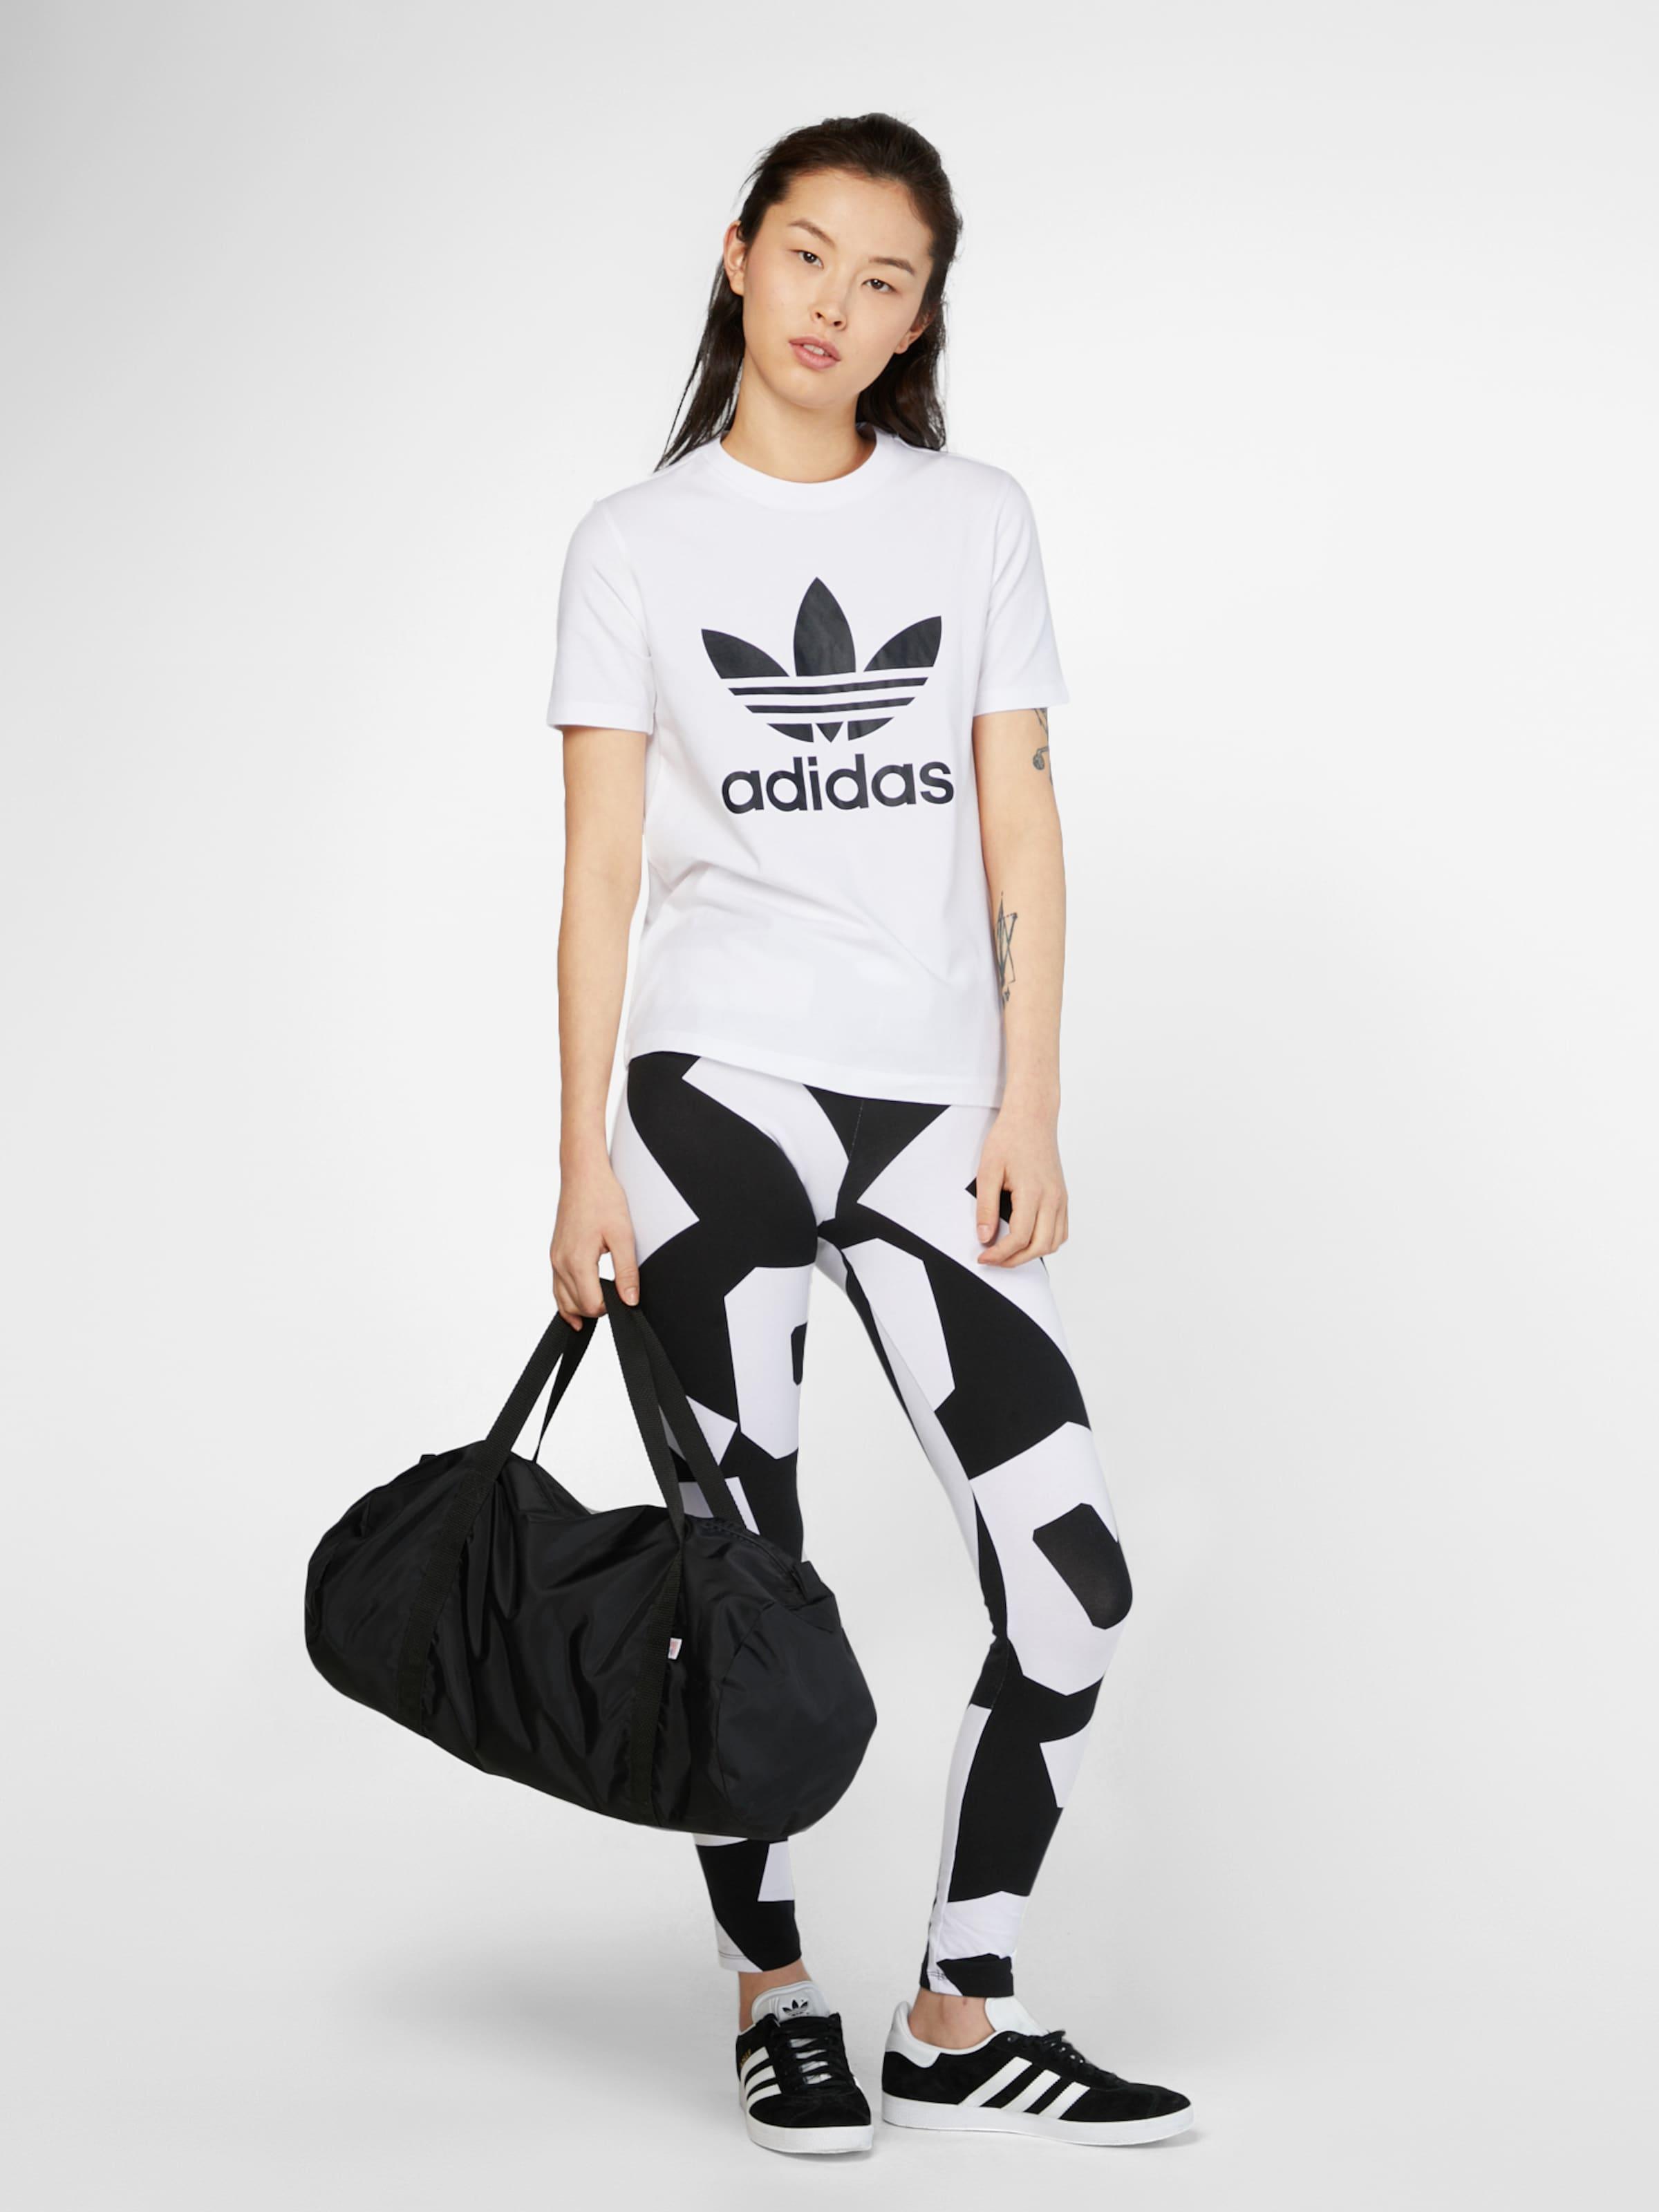 'trefoil' Originals shirt Adidas T NoirBlanc En trCshQd